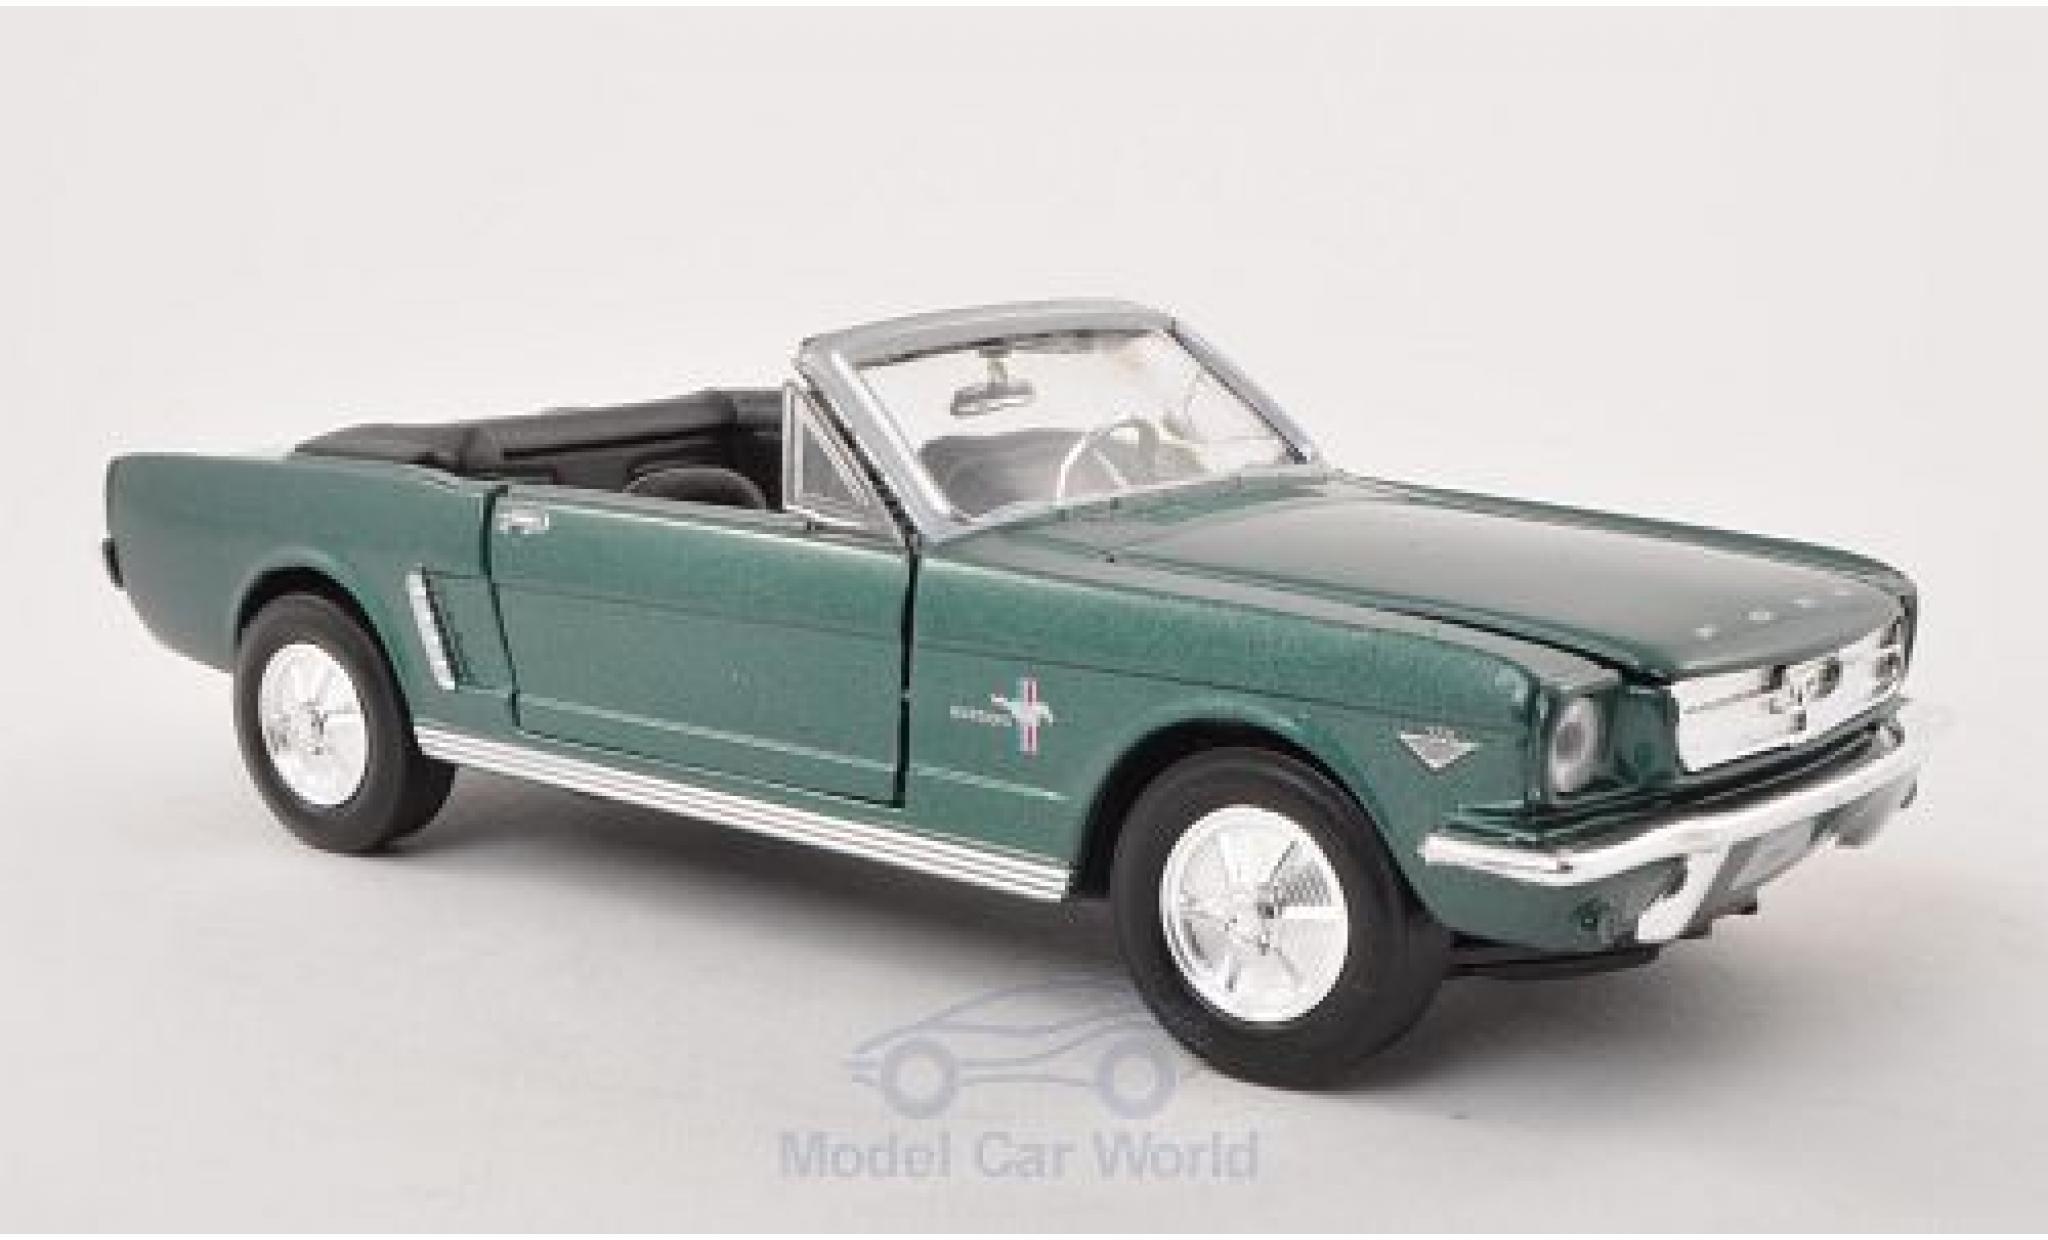 Ford Mustang 1/24 Motormax Convertible metallic green 1964